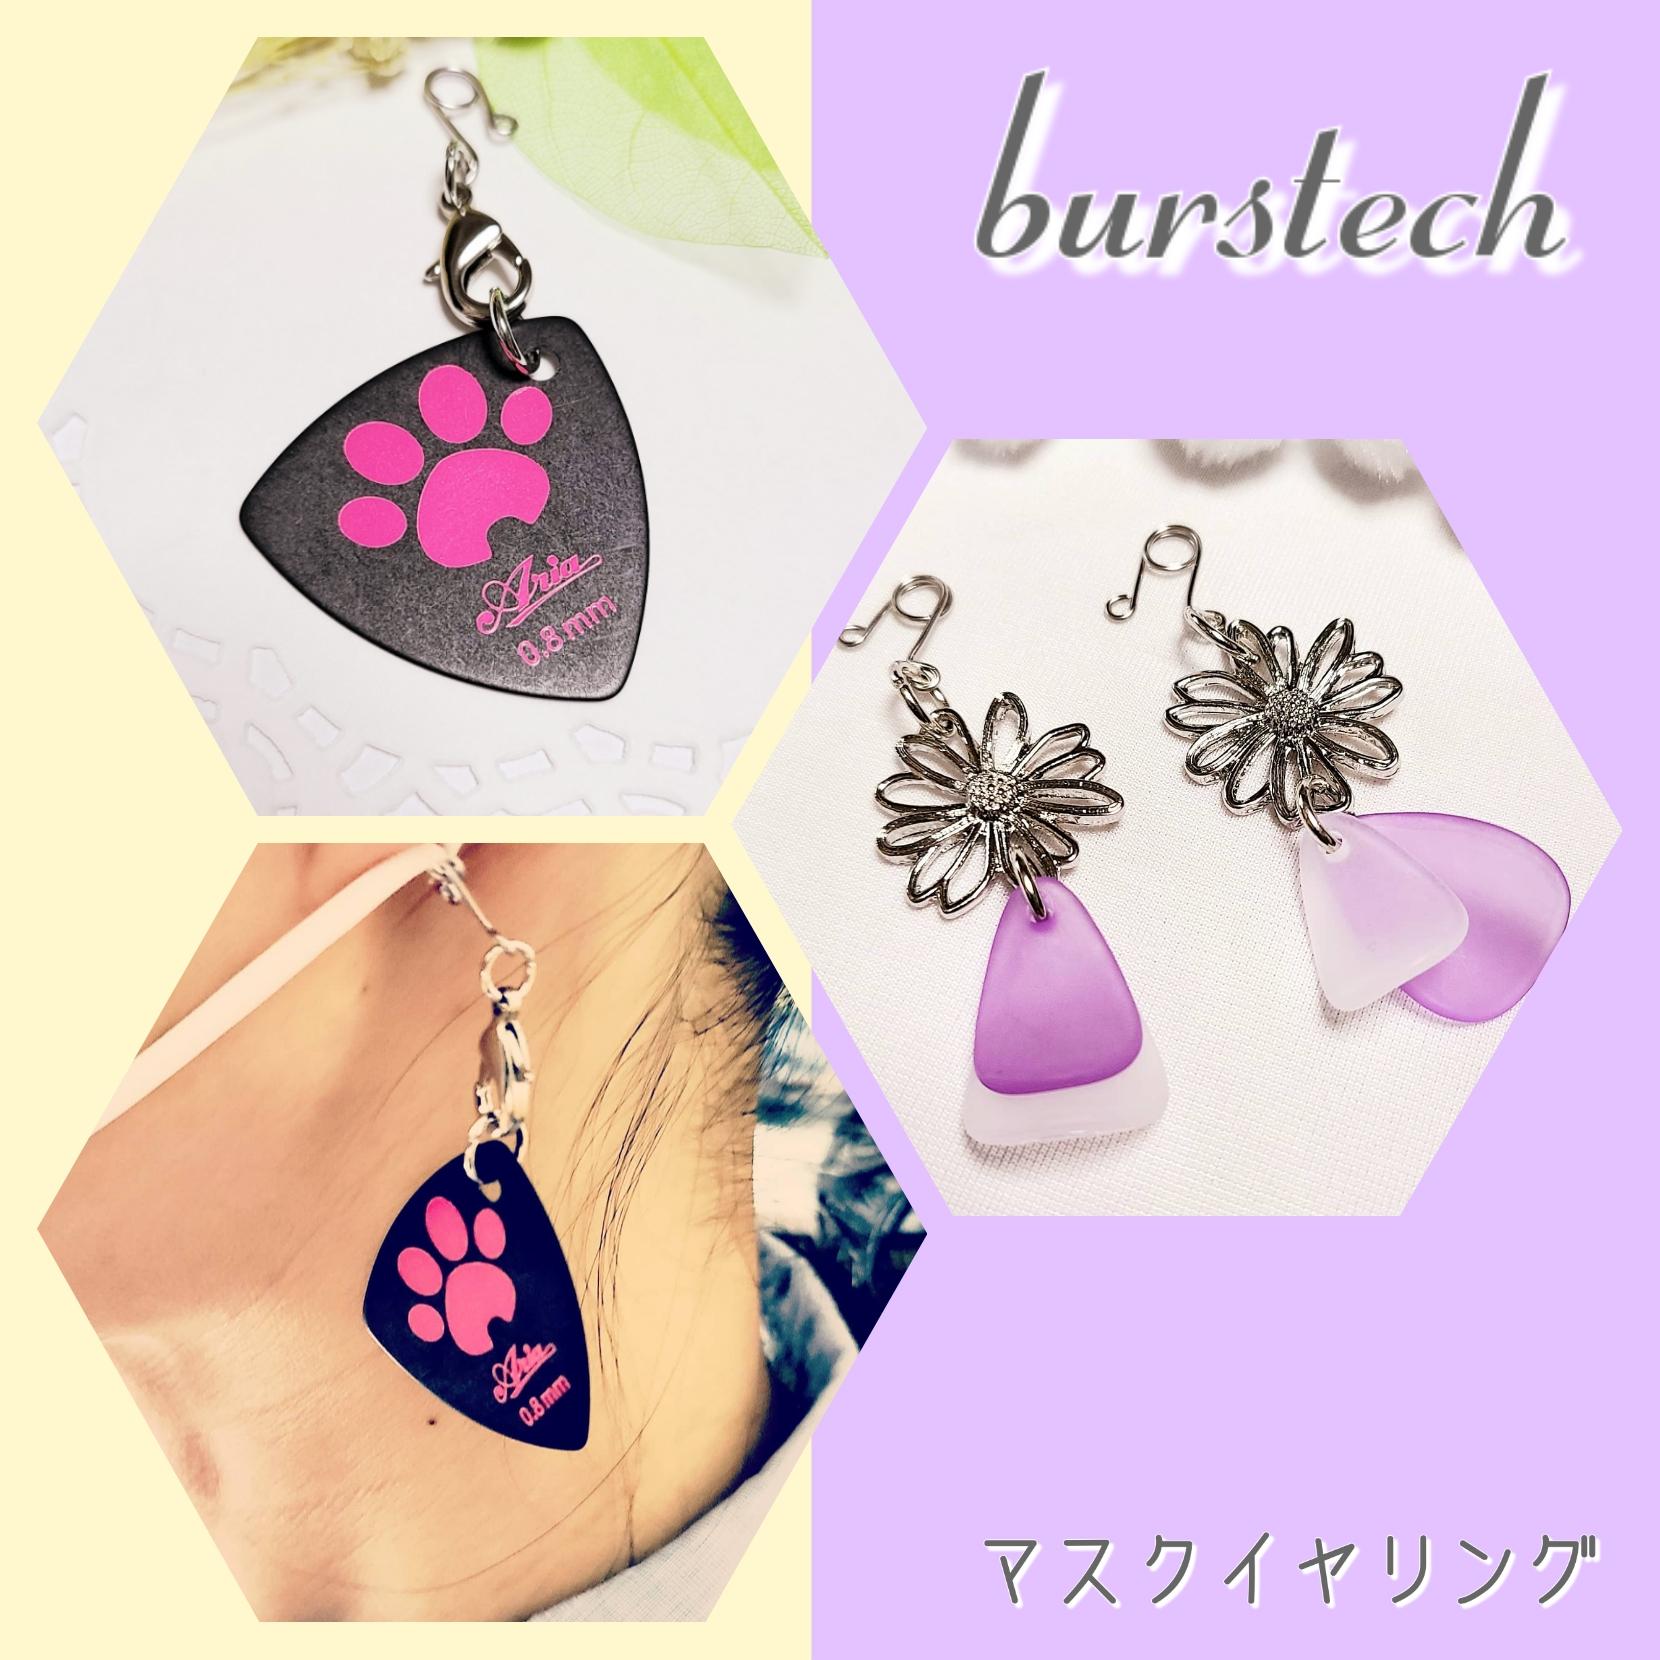 burstech